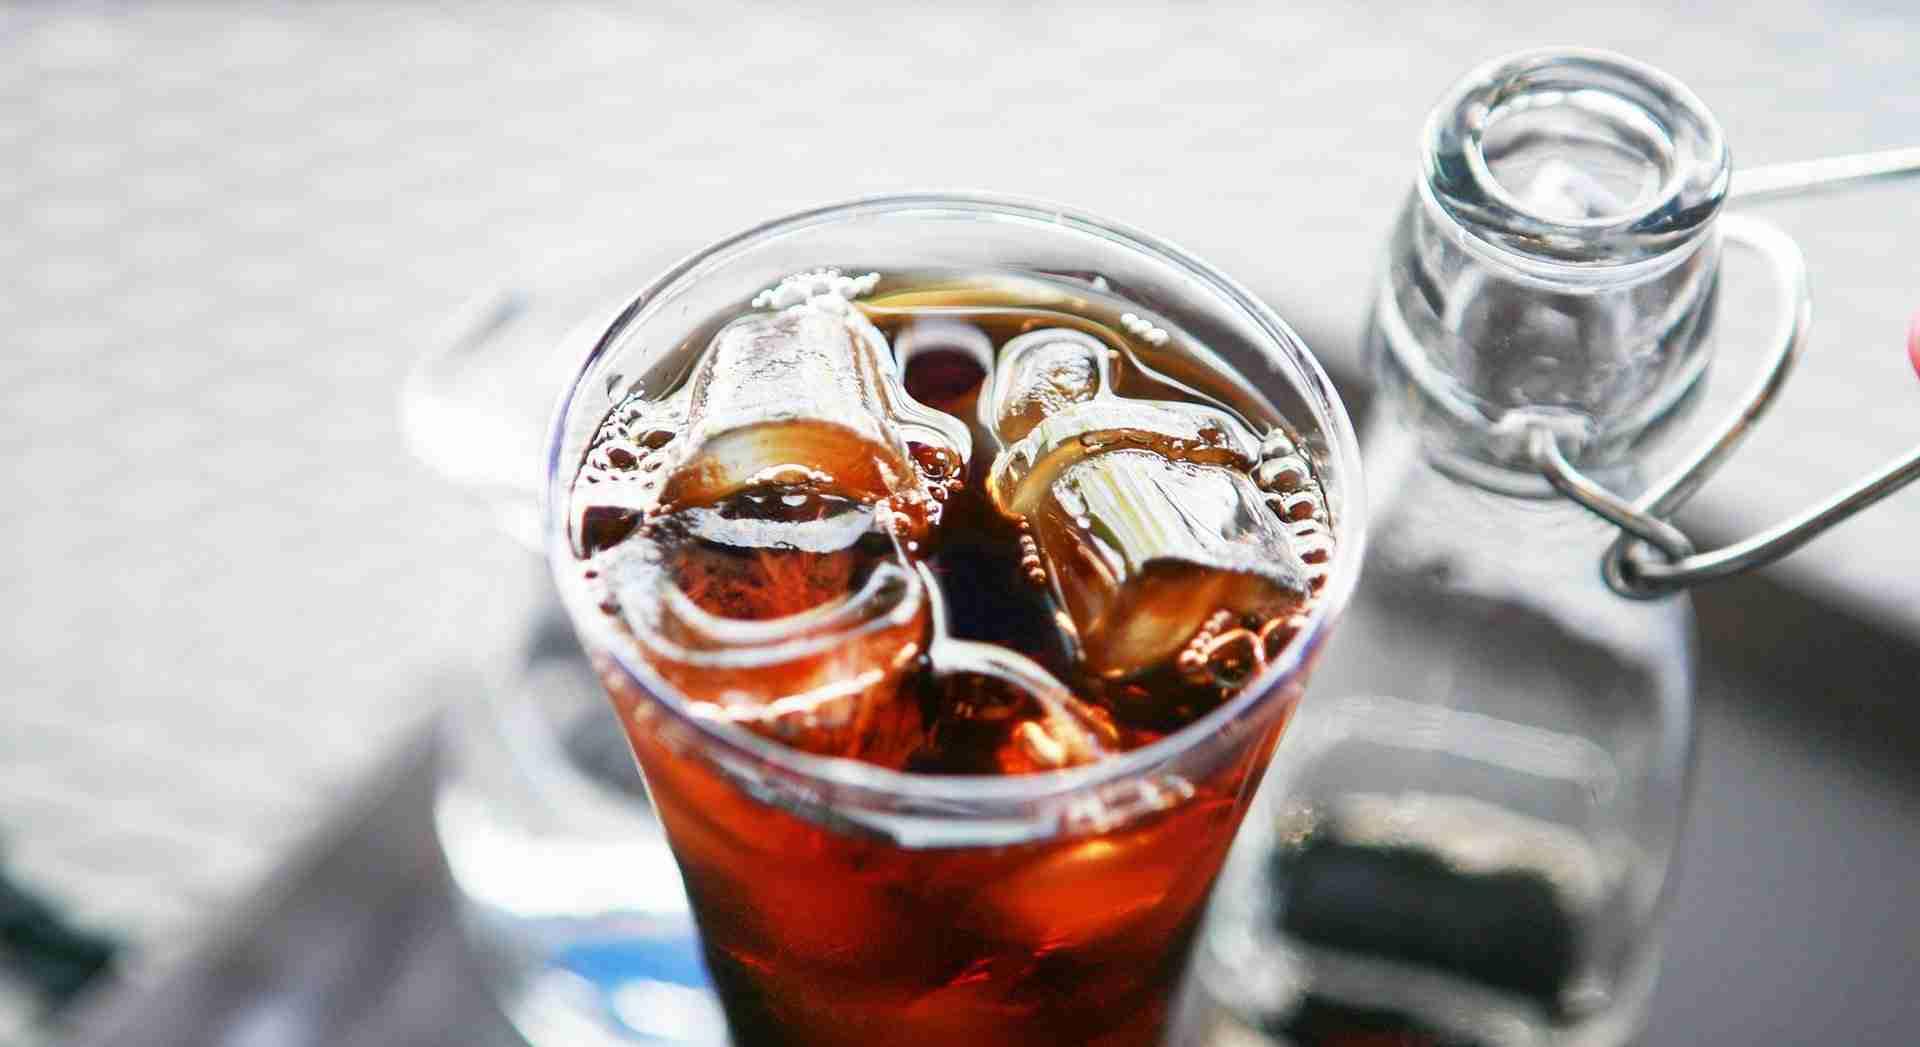 Pfirsich-Eistee Rezept